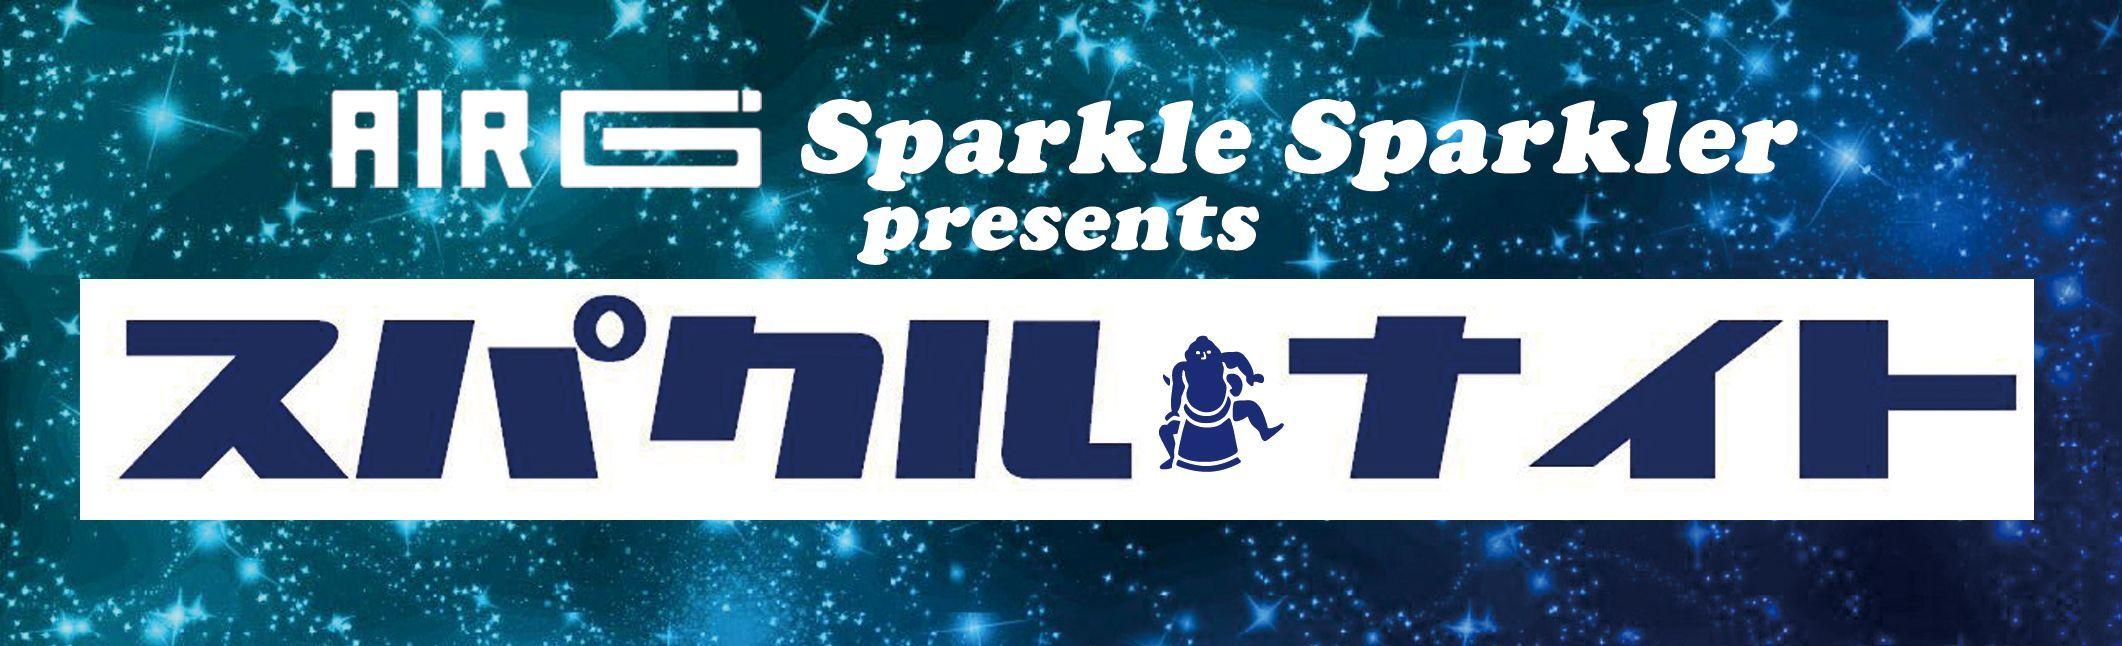 『AIR-G' Sparkle Sparkler presents スパクル☆ナイト Vol.6』